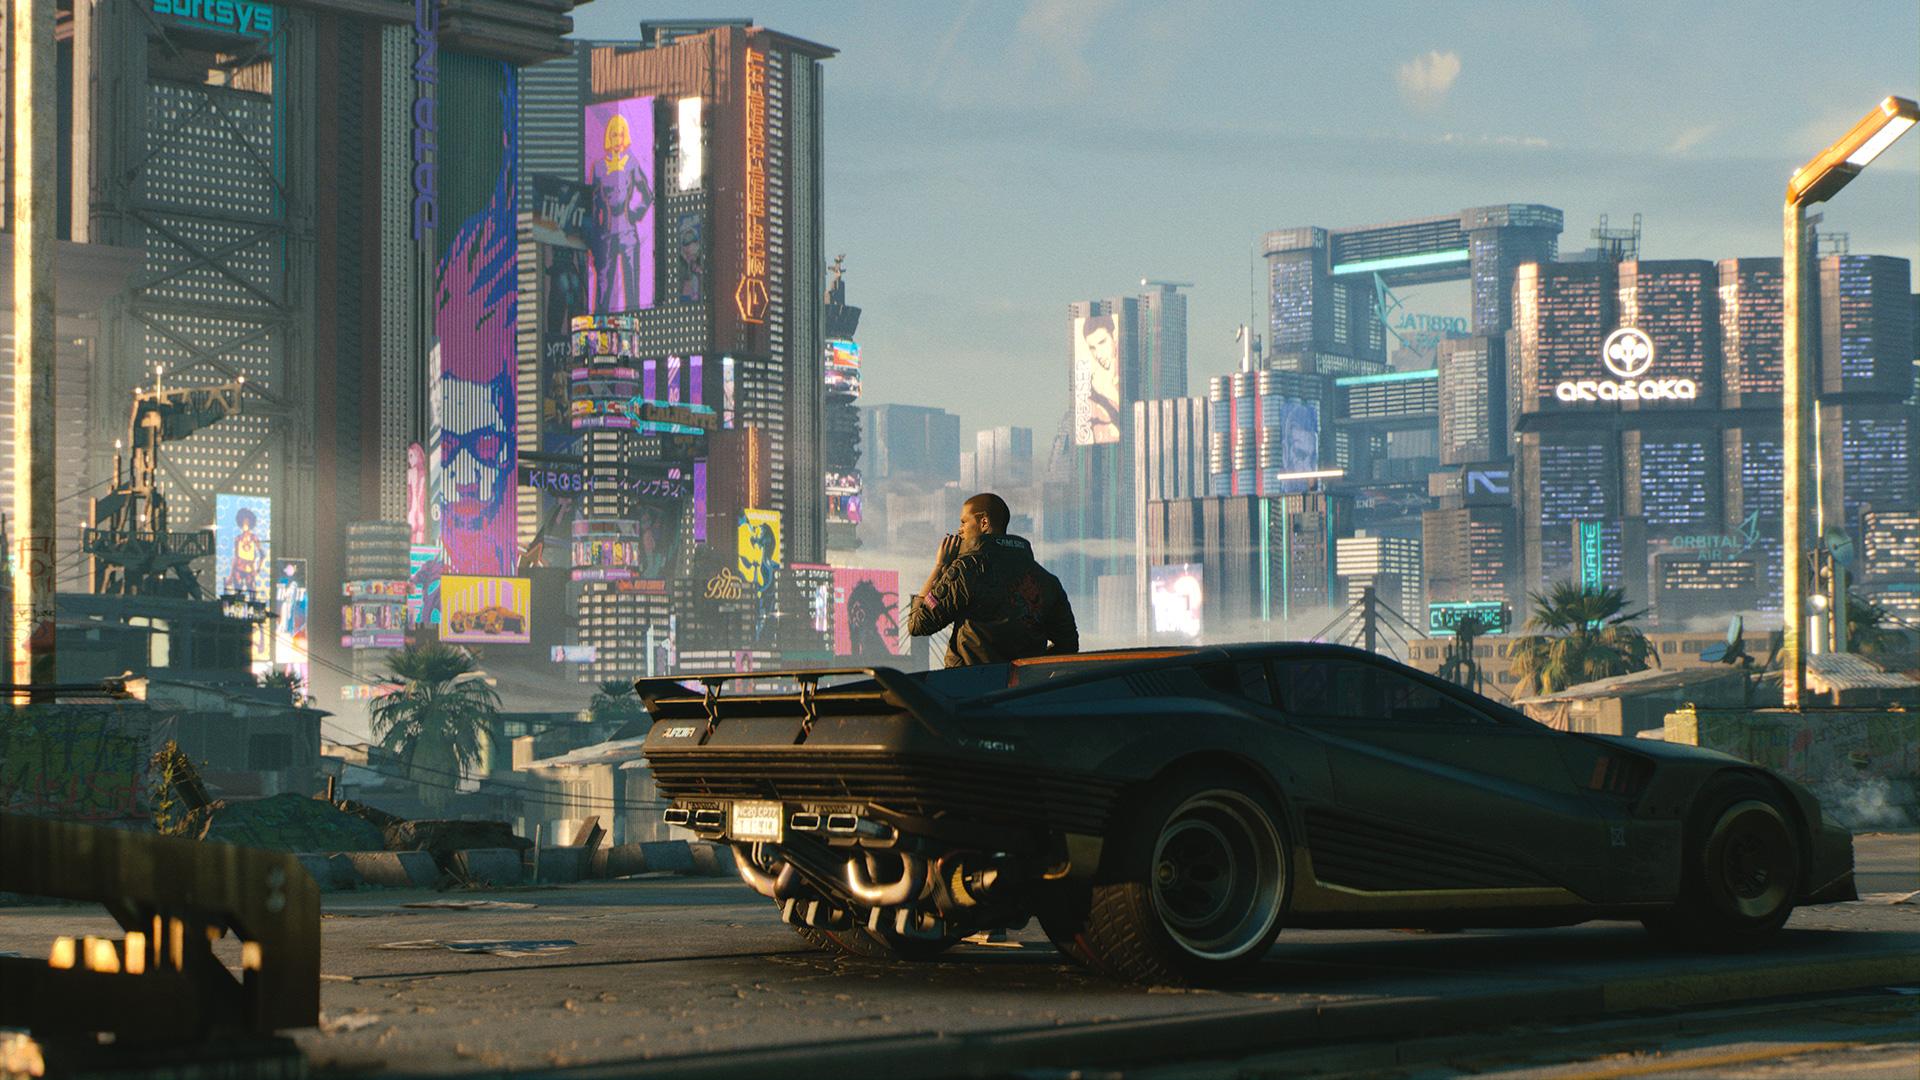 cyberpunk 2077, cyberpunk art, cyberpunk game release, new game releases